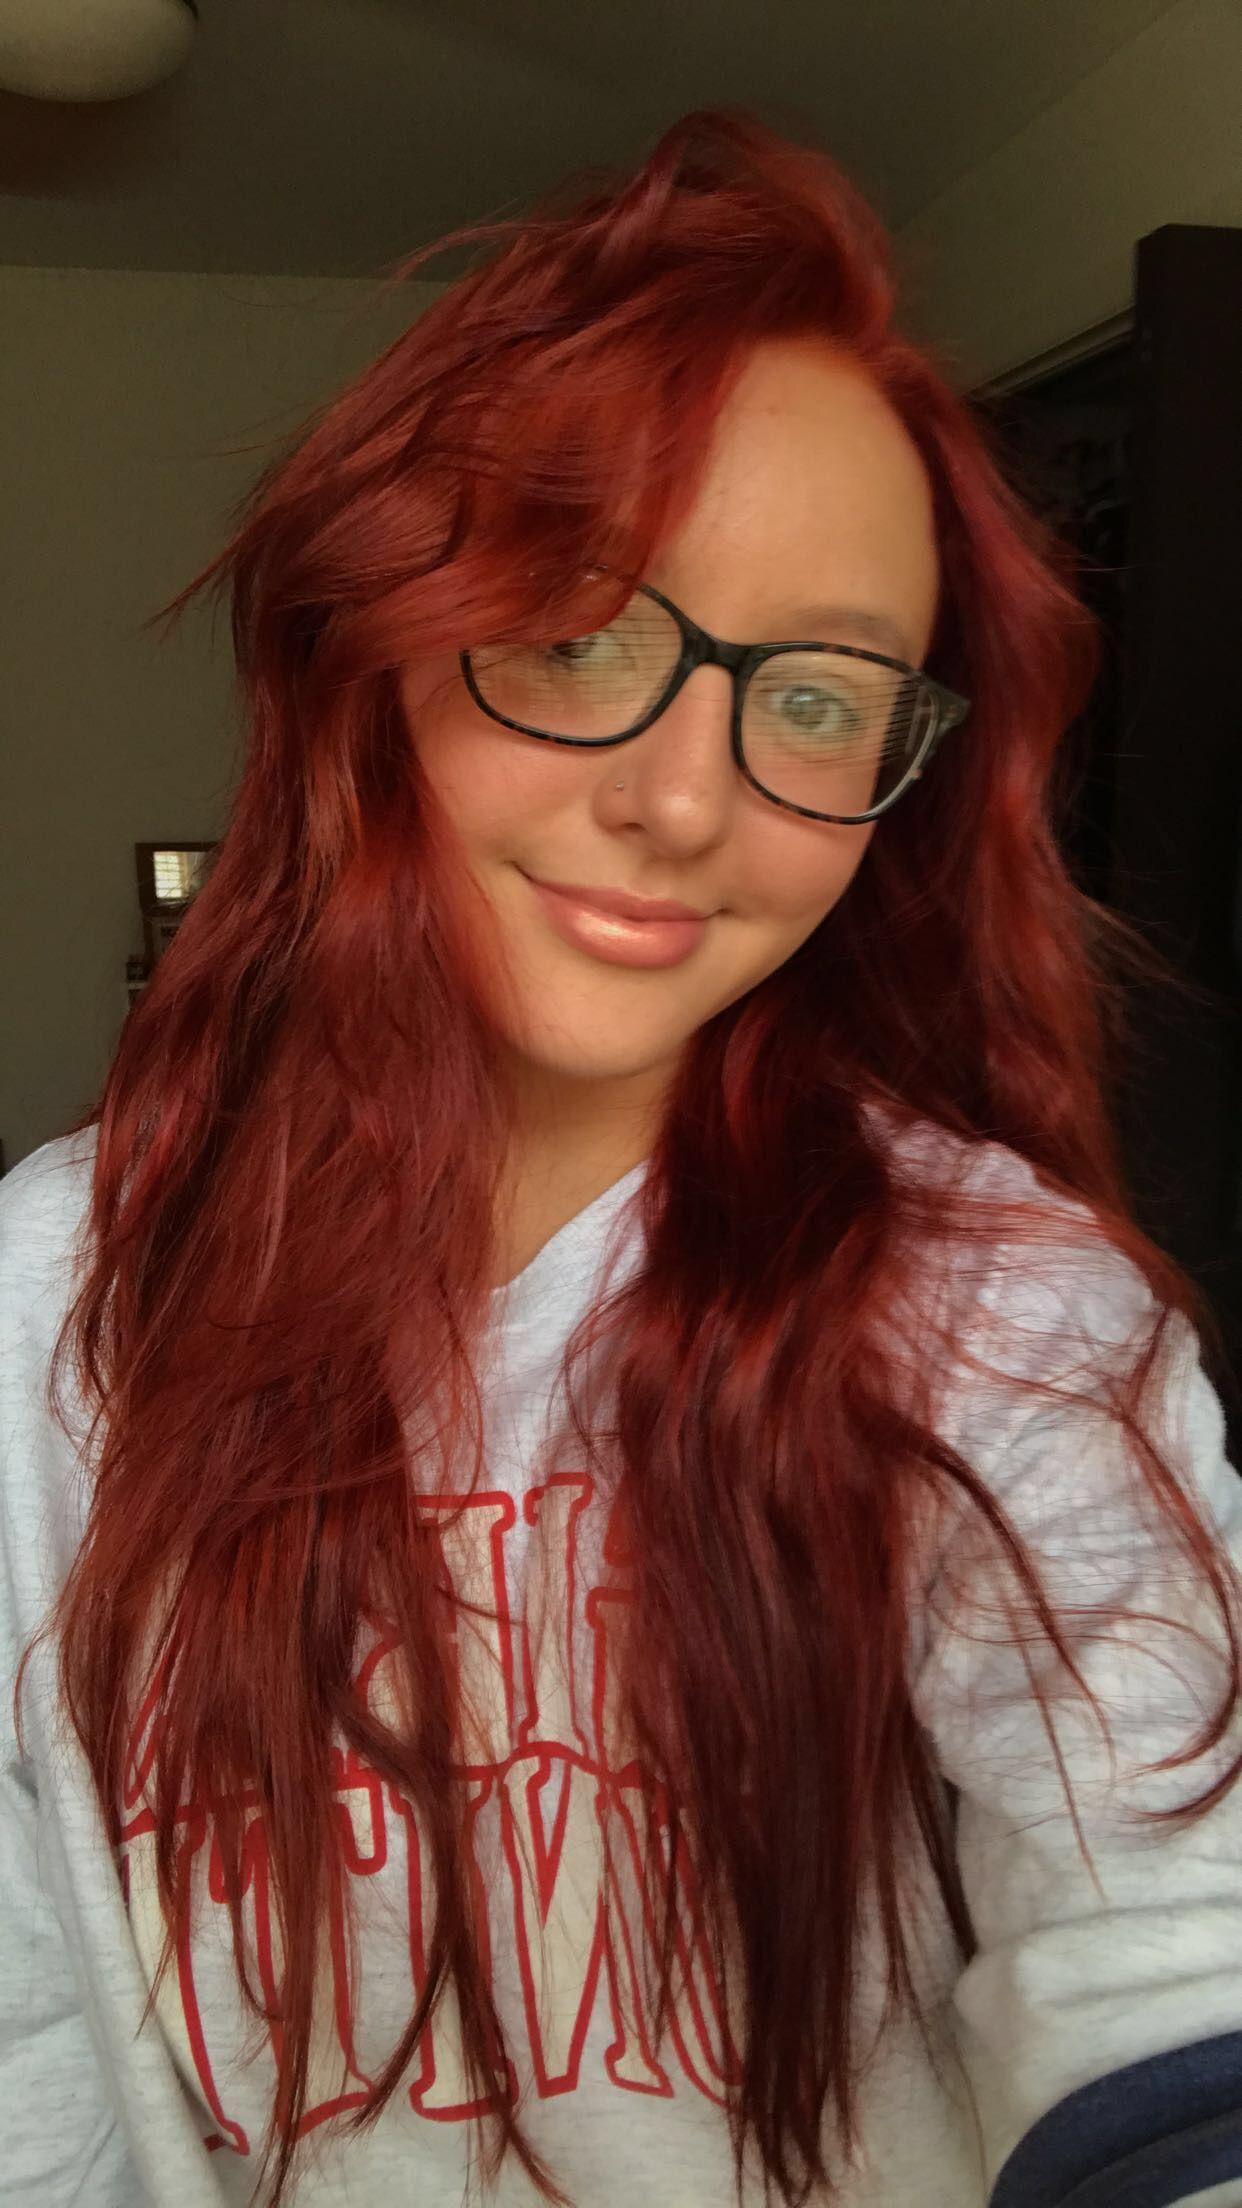 Arctic Fox Hair Dye Fox Hair Dye Red Orange Hair Arctic Fox Hair Dye